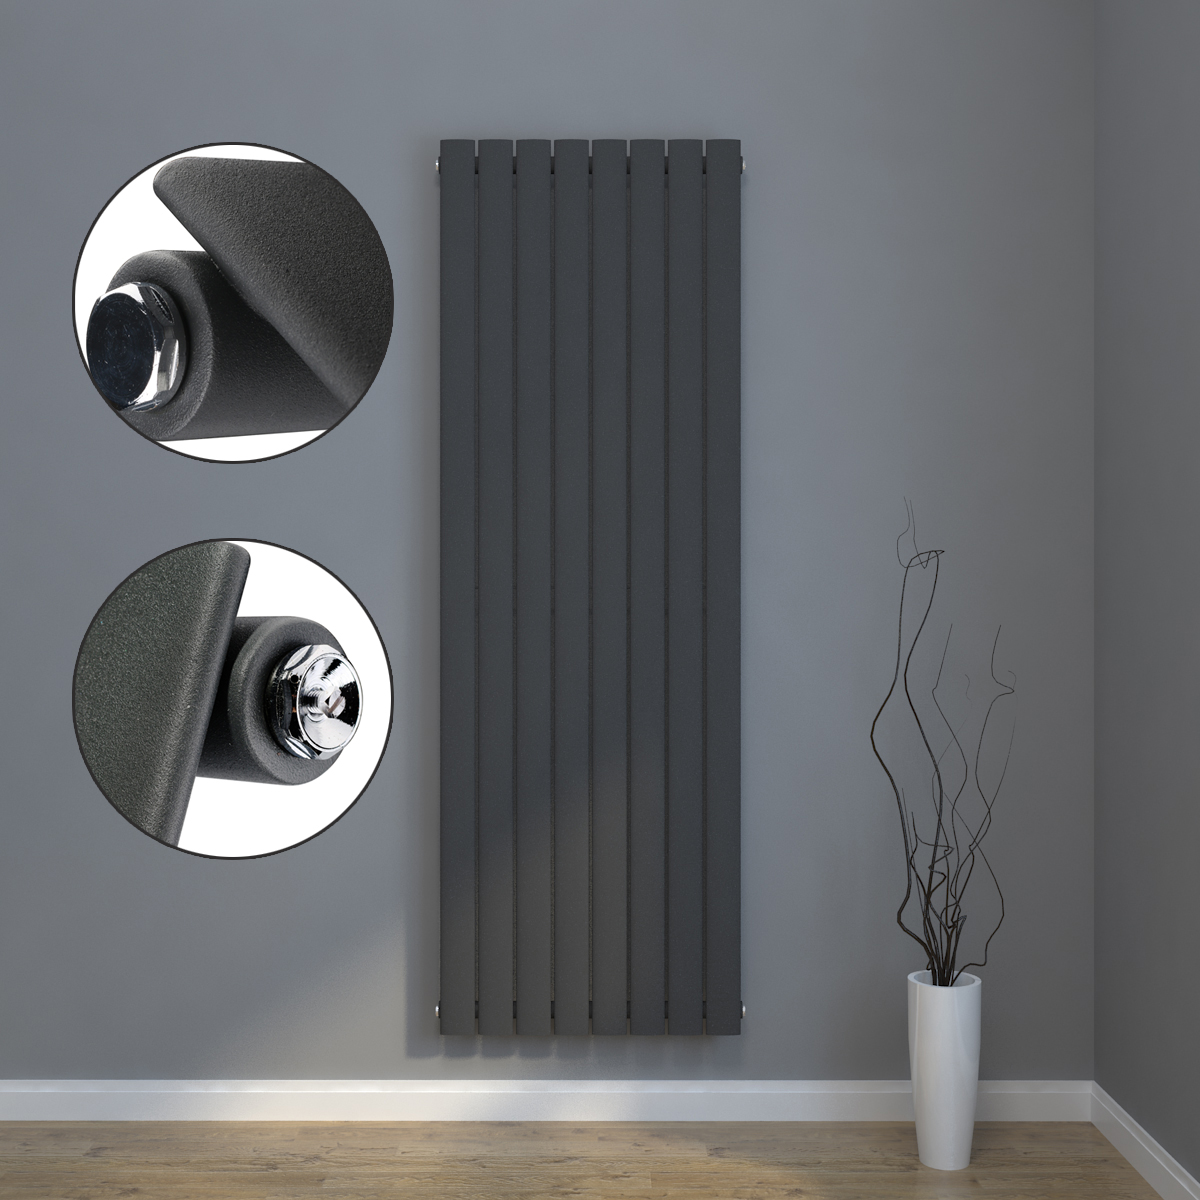 design heizk rper mittelanschluss badheizk rper flachheizk rper wandheizk rper ebay. Black Bedroom Furniture Sets. Home Design Ideas